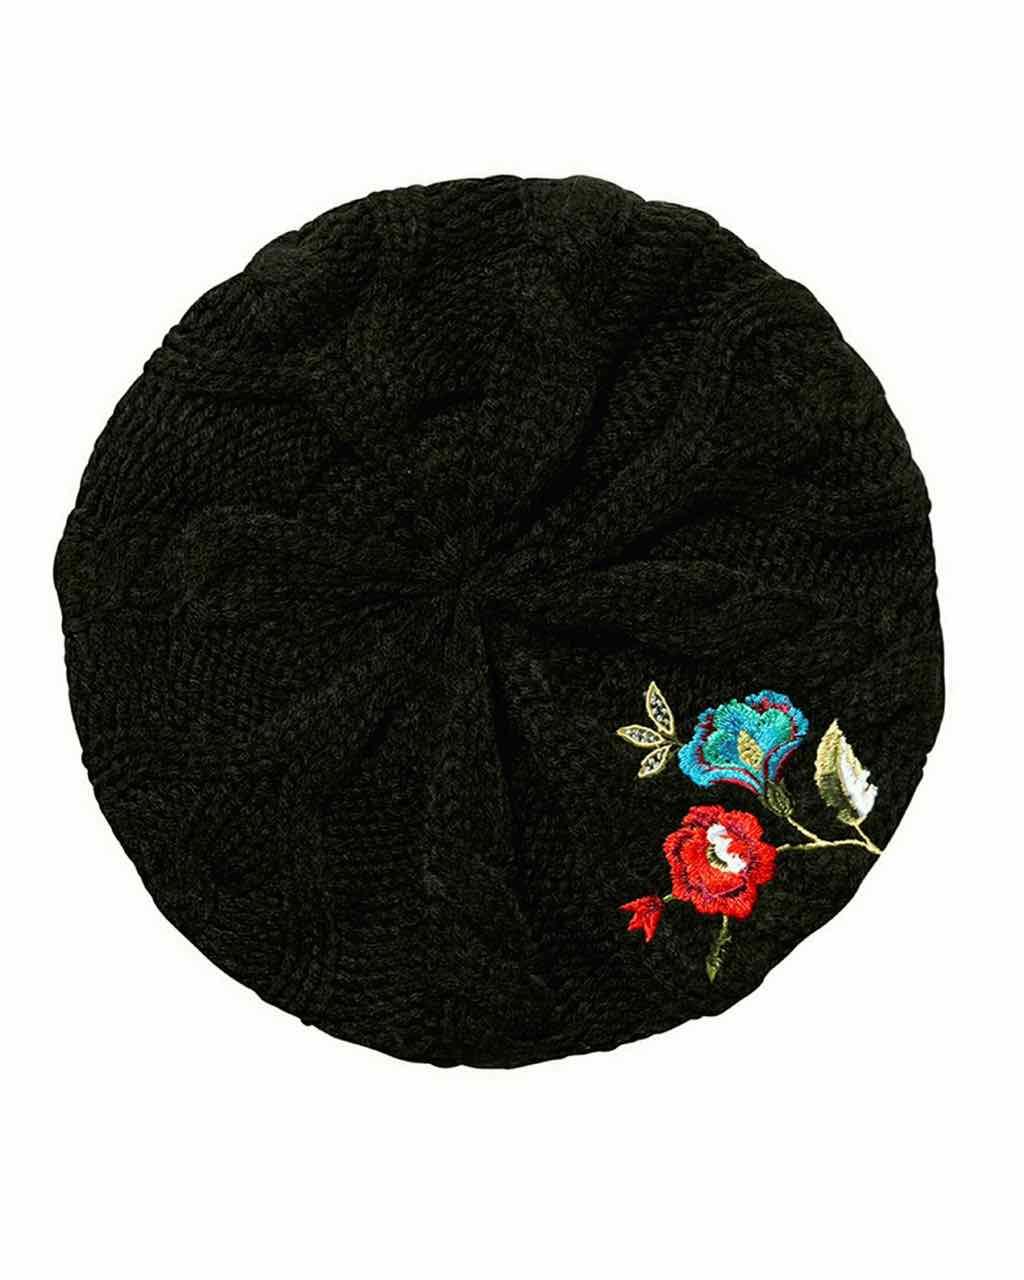 17WAHF08_2000 Desigual Hat Caribou Buy Online